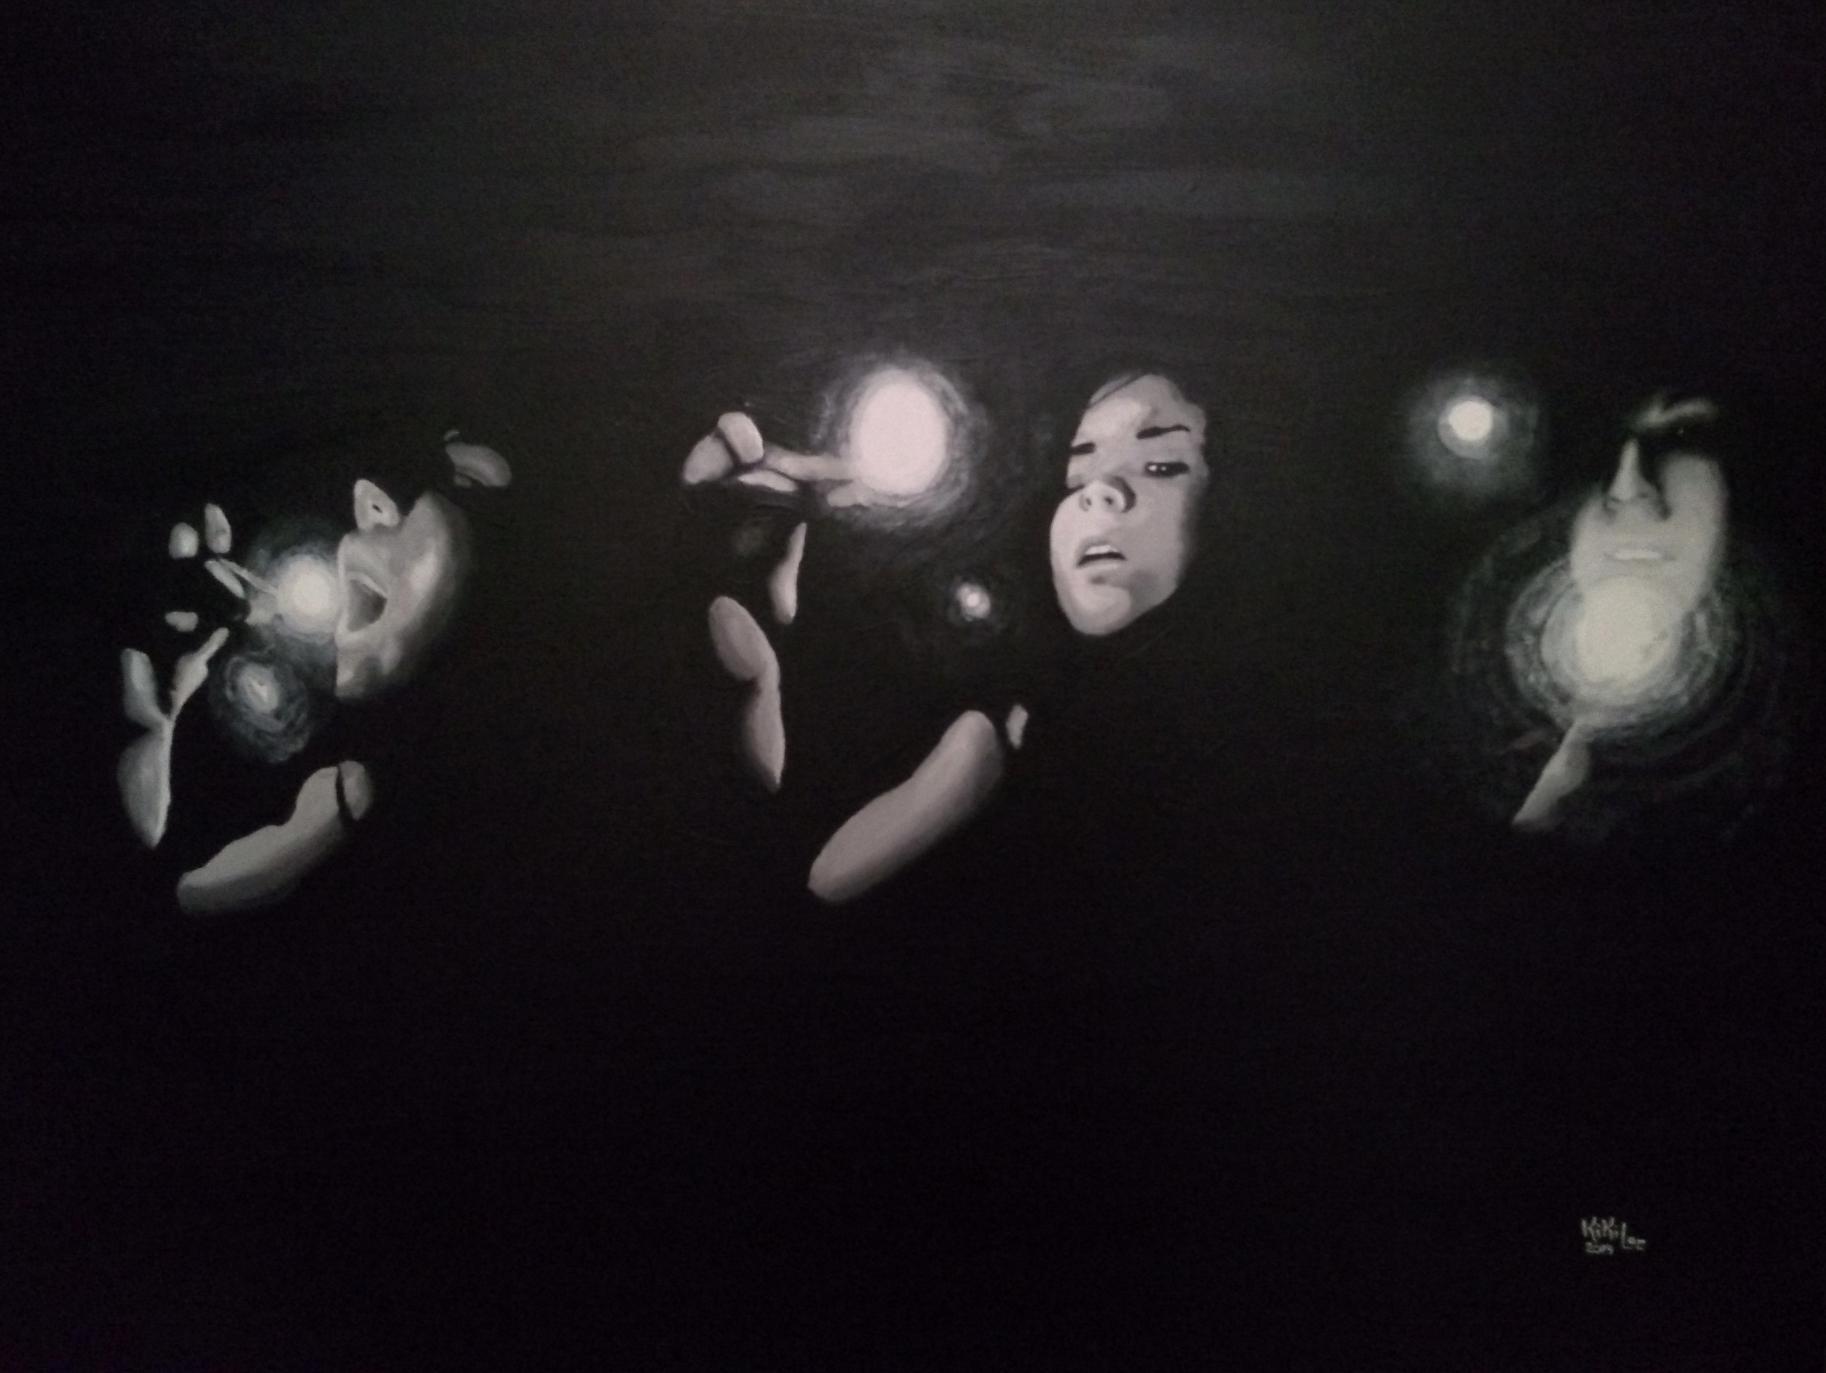 Defying Darkness (2019) - Kirsten Loewenthal - KikiLoe